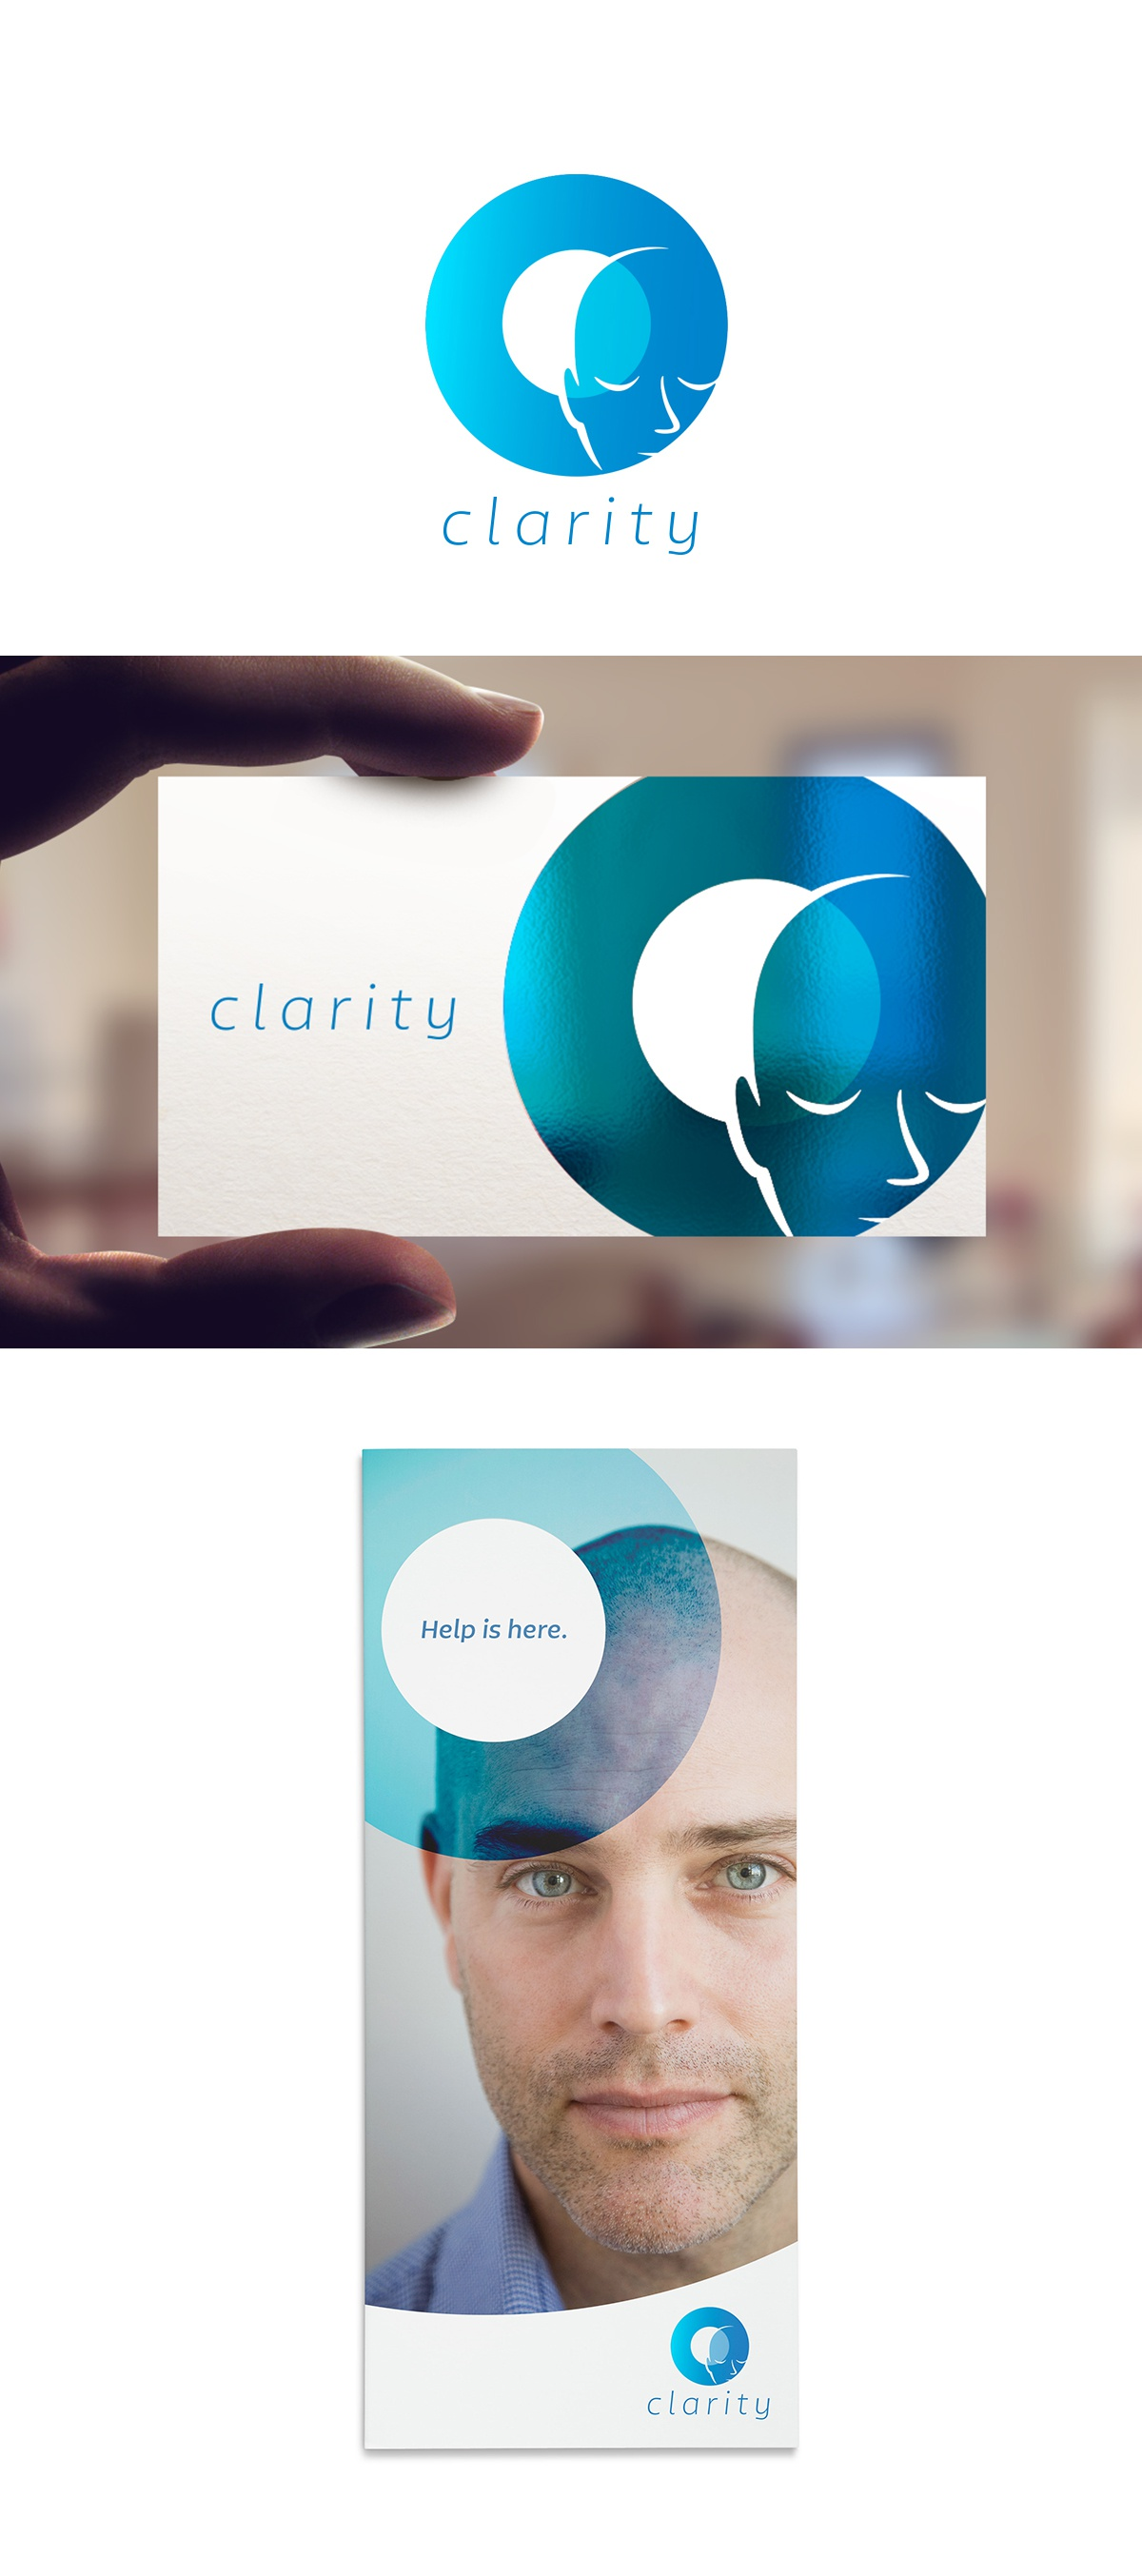 Clarity big